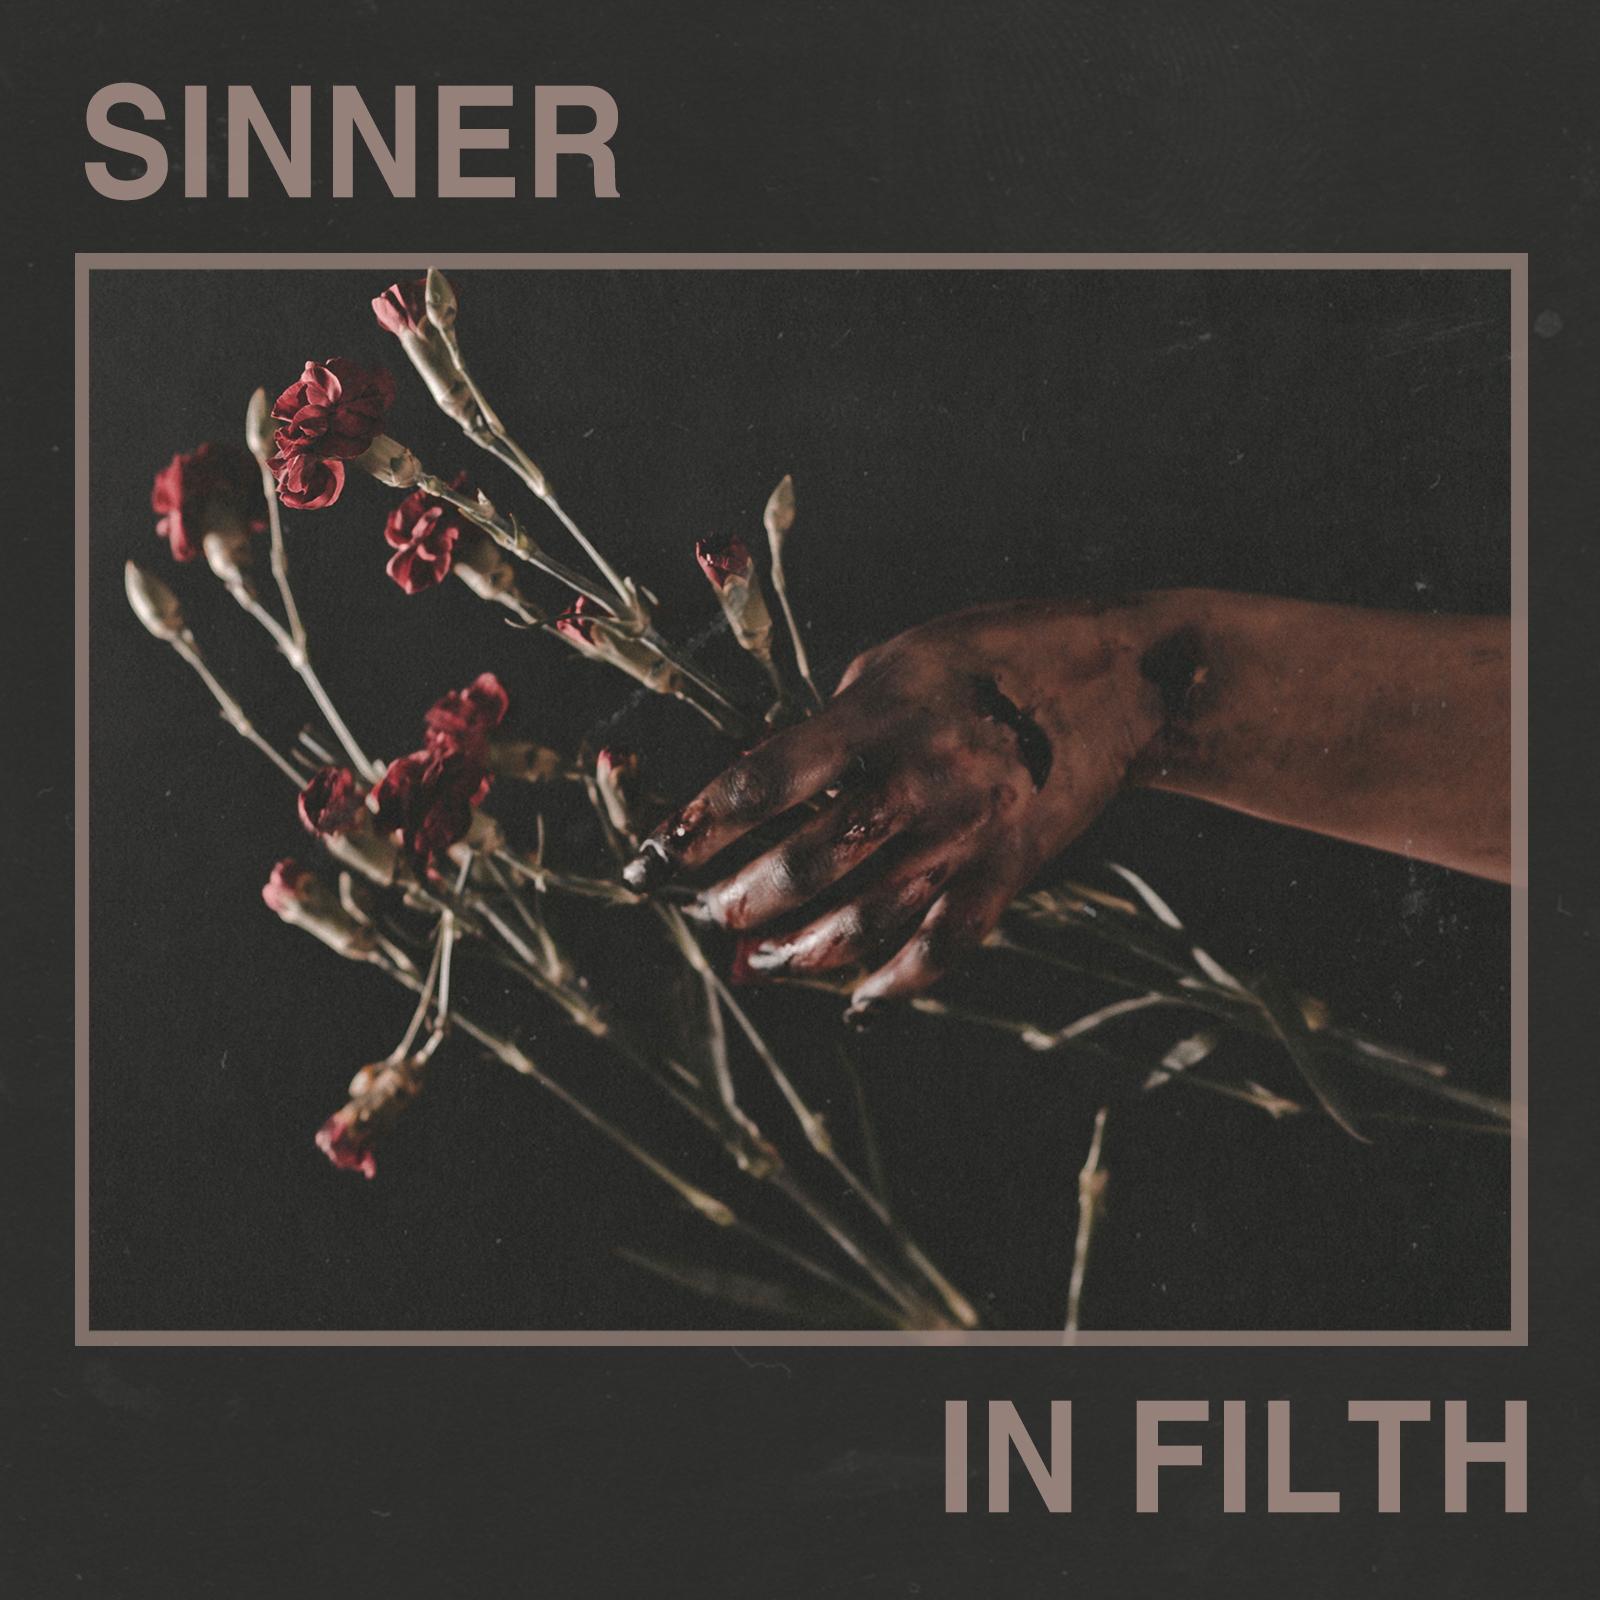 SINNER-INFILTH-FRONT-HI.jpg